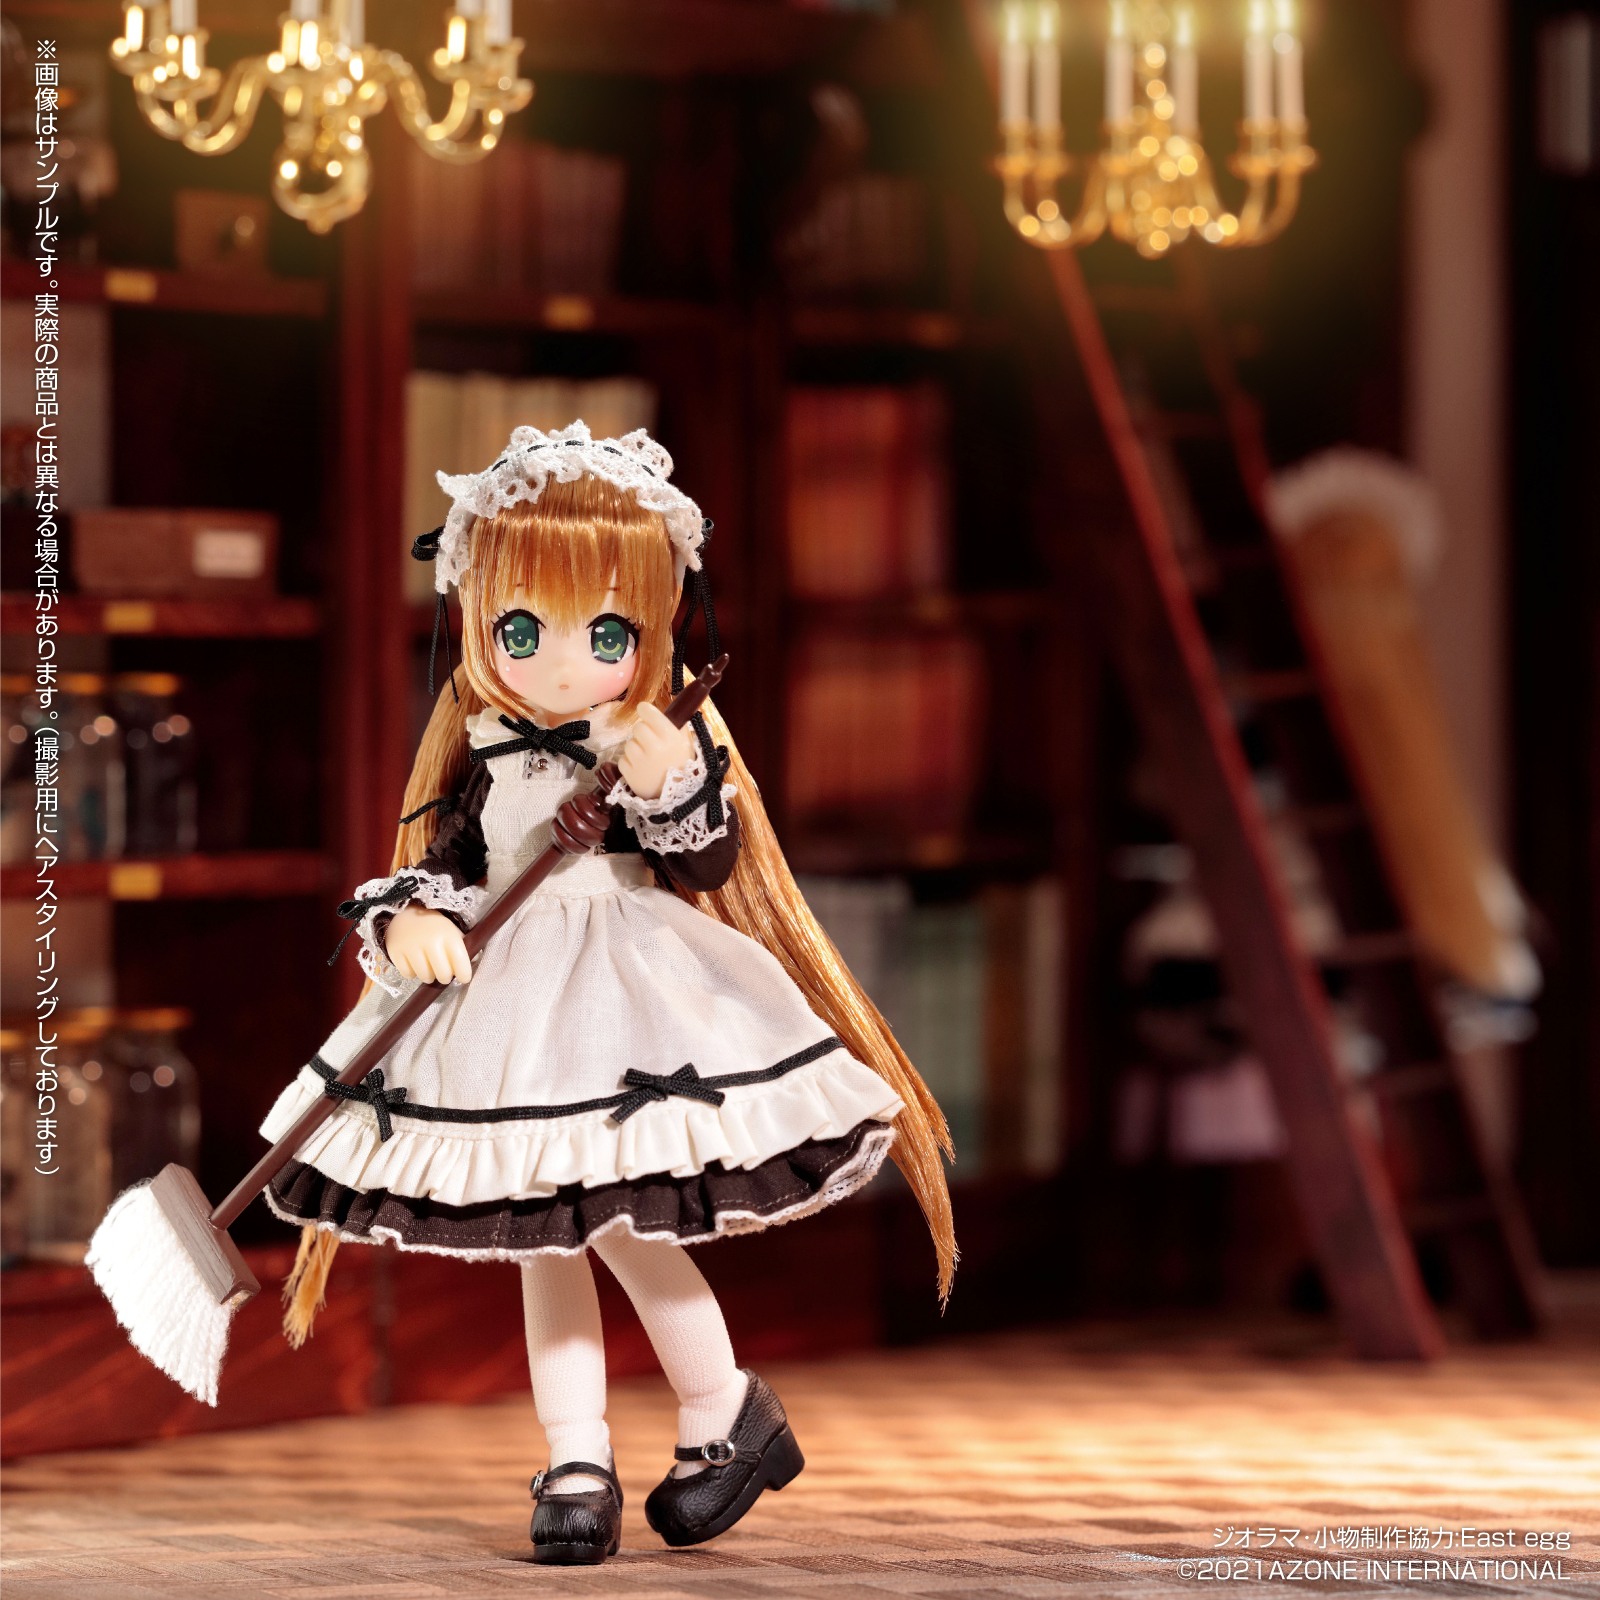 Lil'Fairy ~ちいさなお手伝いさん~『リプー 7th anniv.(ノーマル口ver.)』1/12 完成品ドール-001